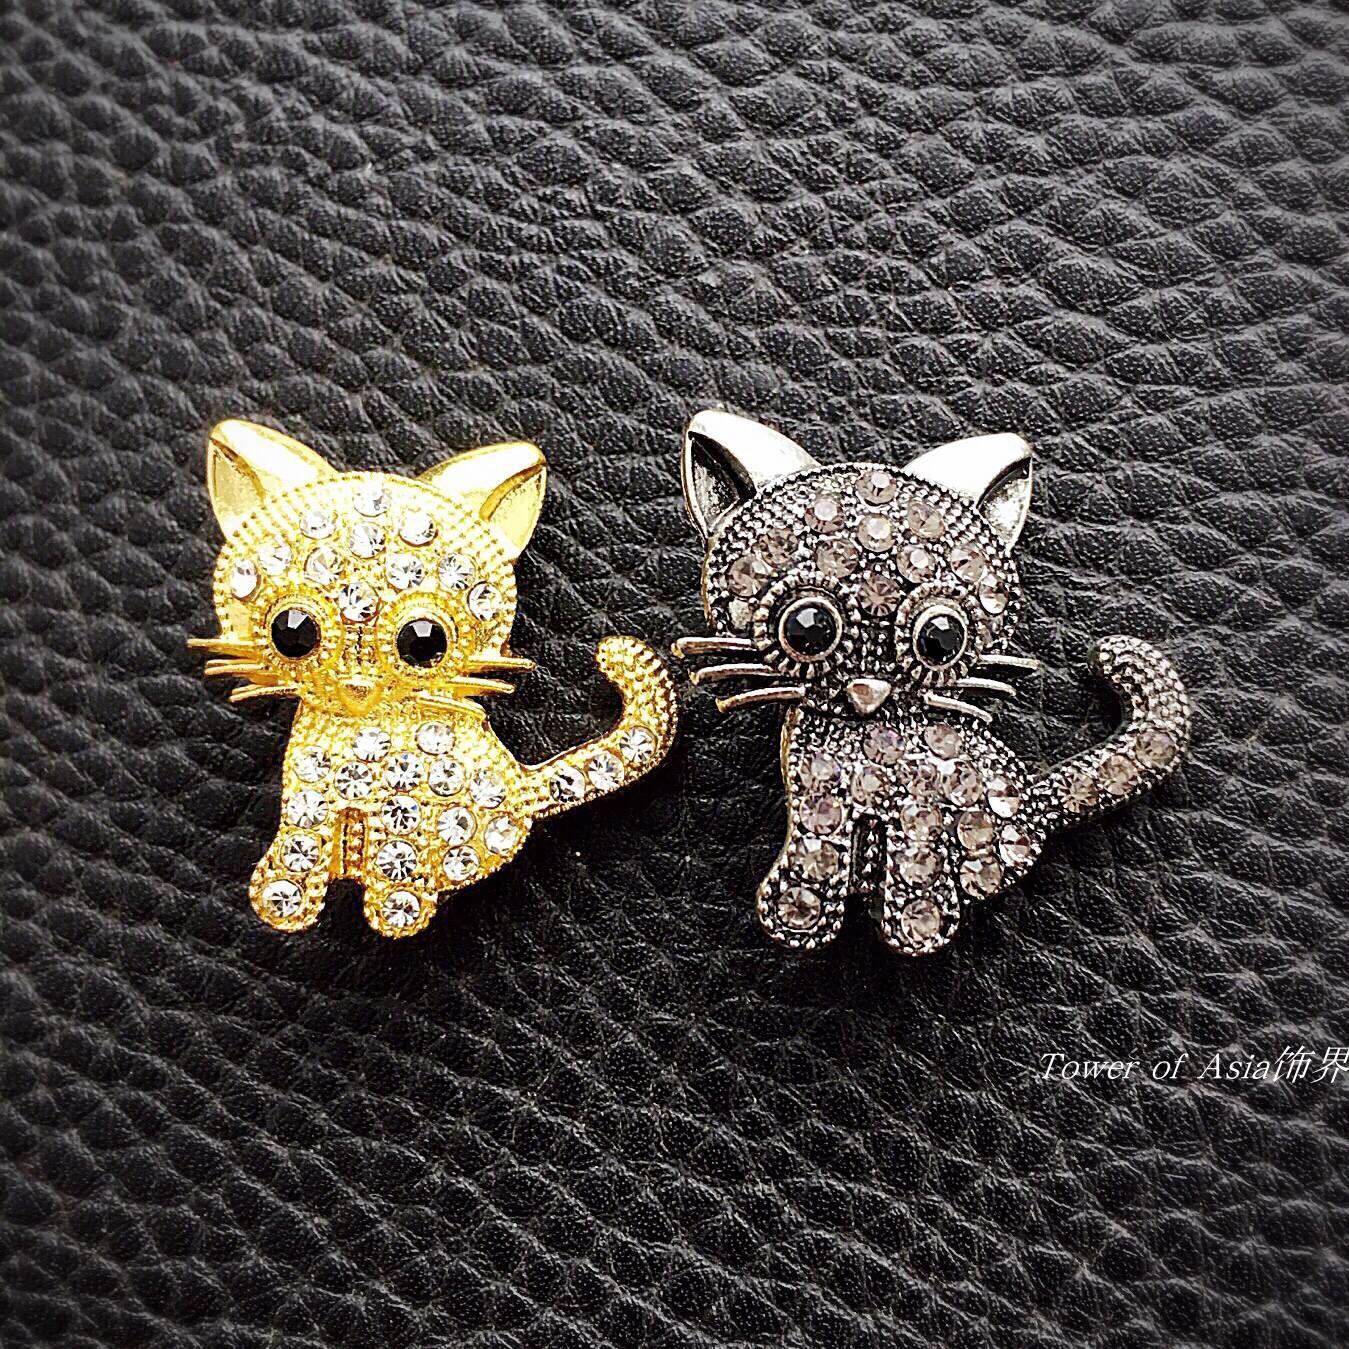 Japan and South Korea popular cute kitten Brooch female denim accessories accessories Rhinestone retro Brooch gadgets gifts